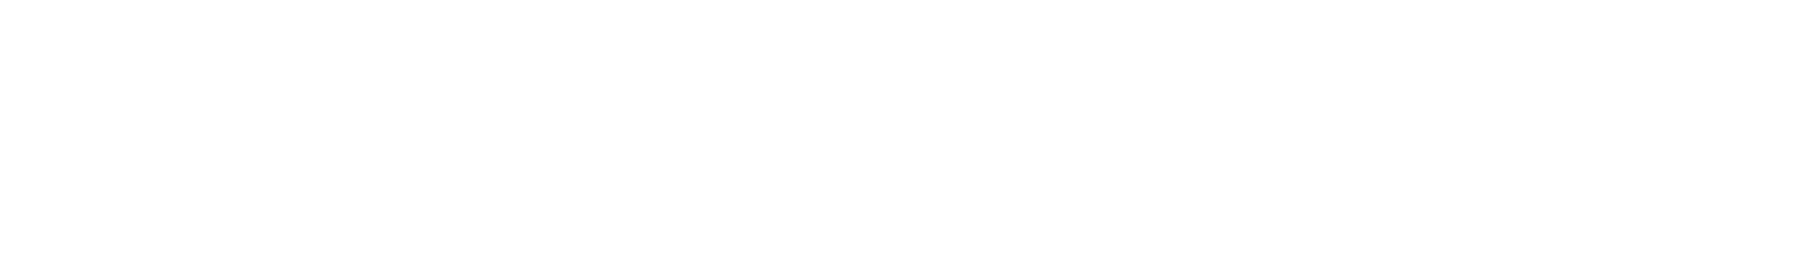 madashell